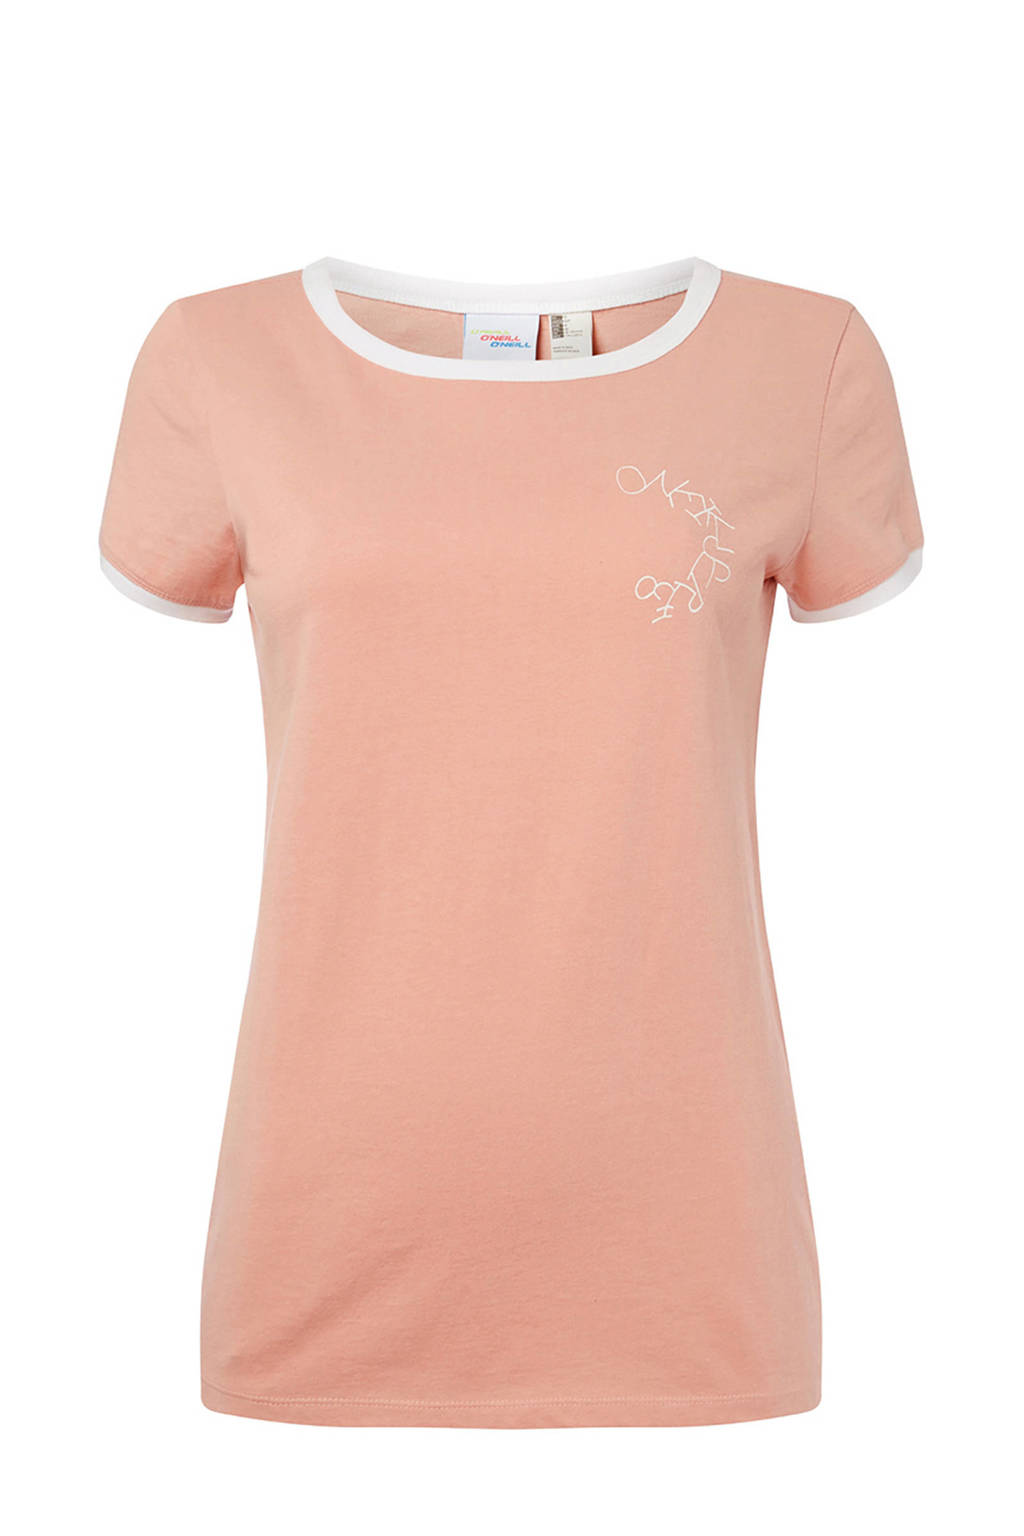 WE Fashion T-shirt vintage pink, Vintage Pink